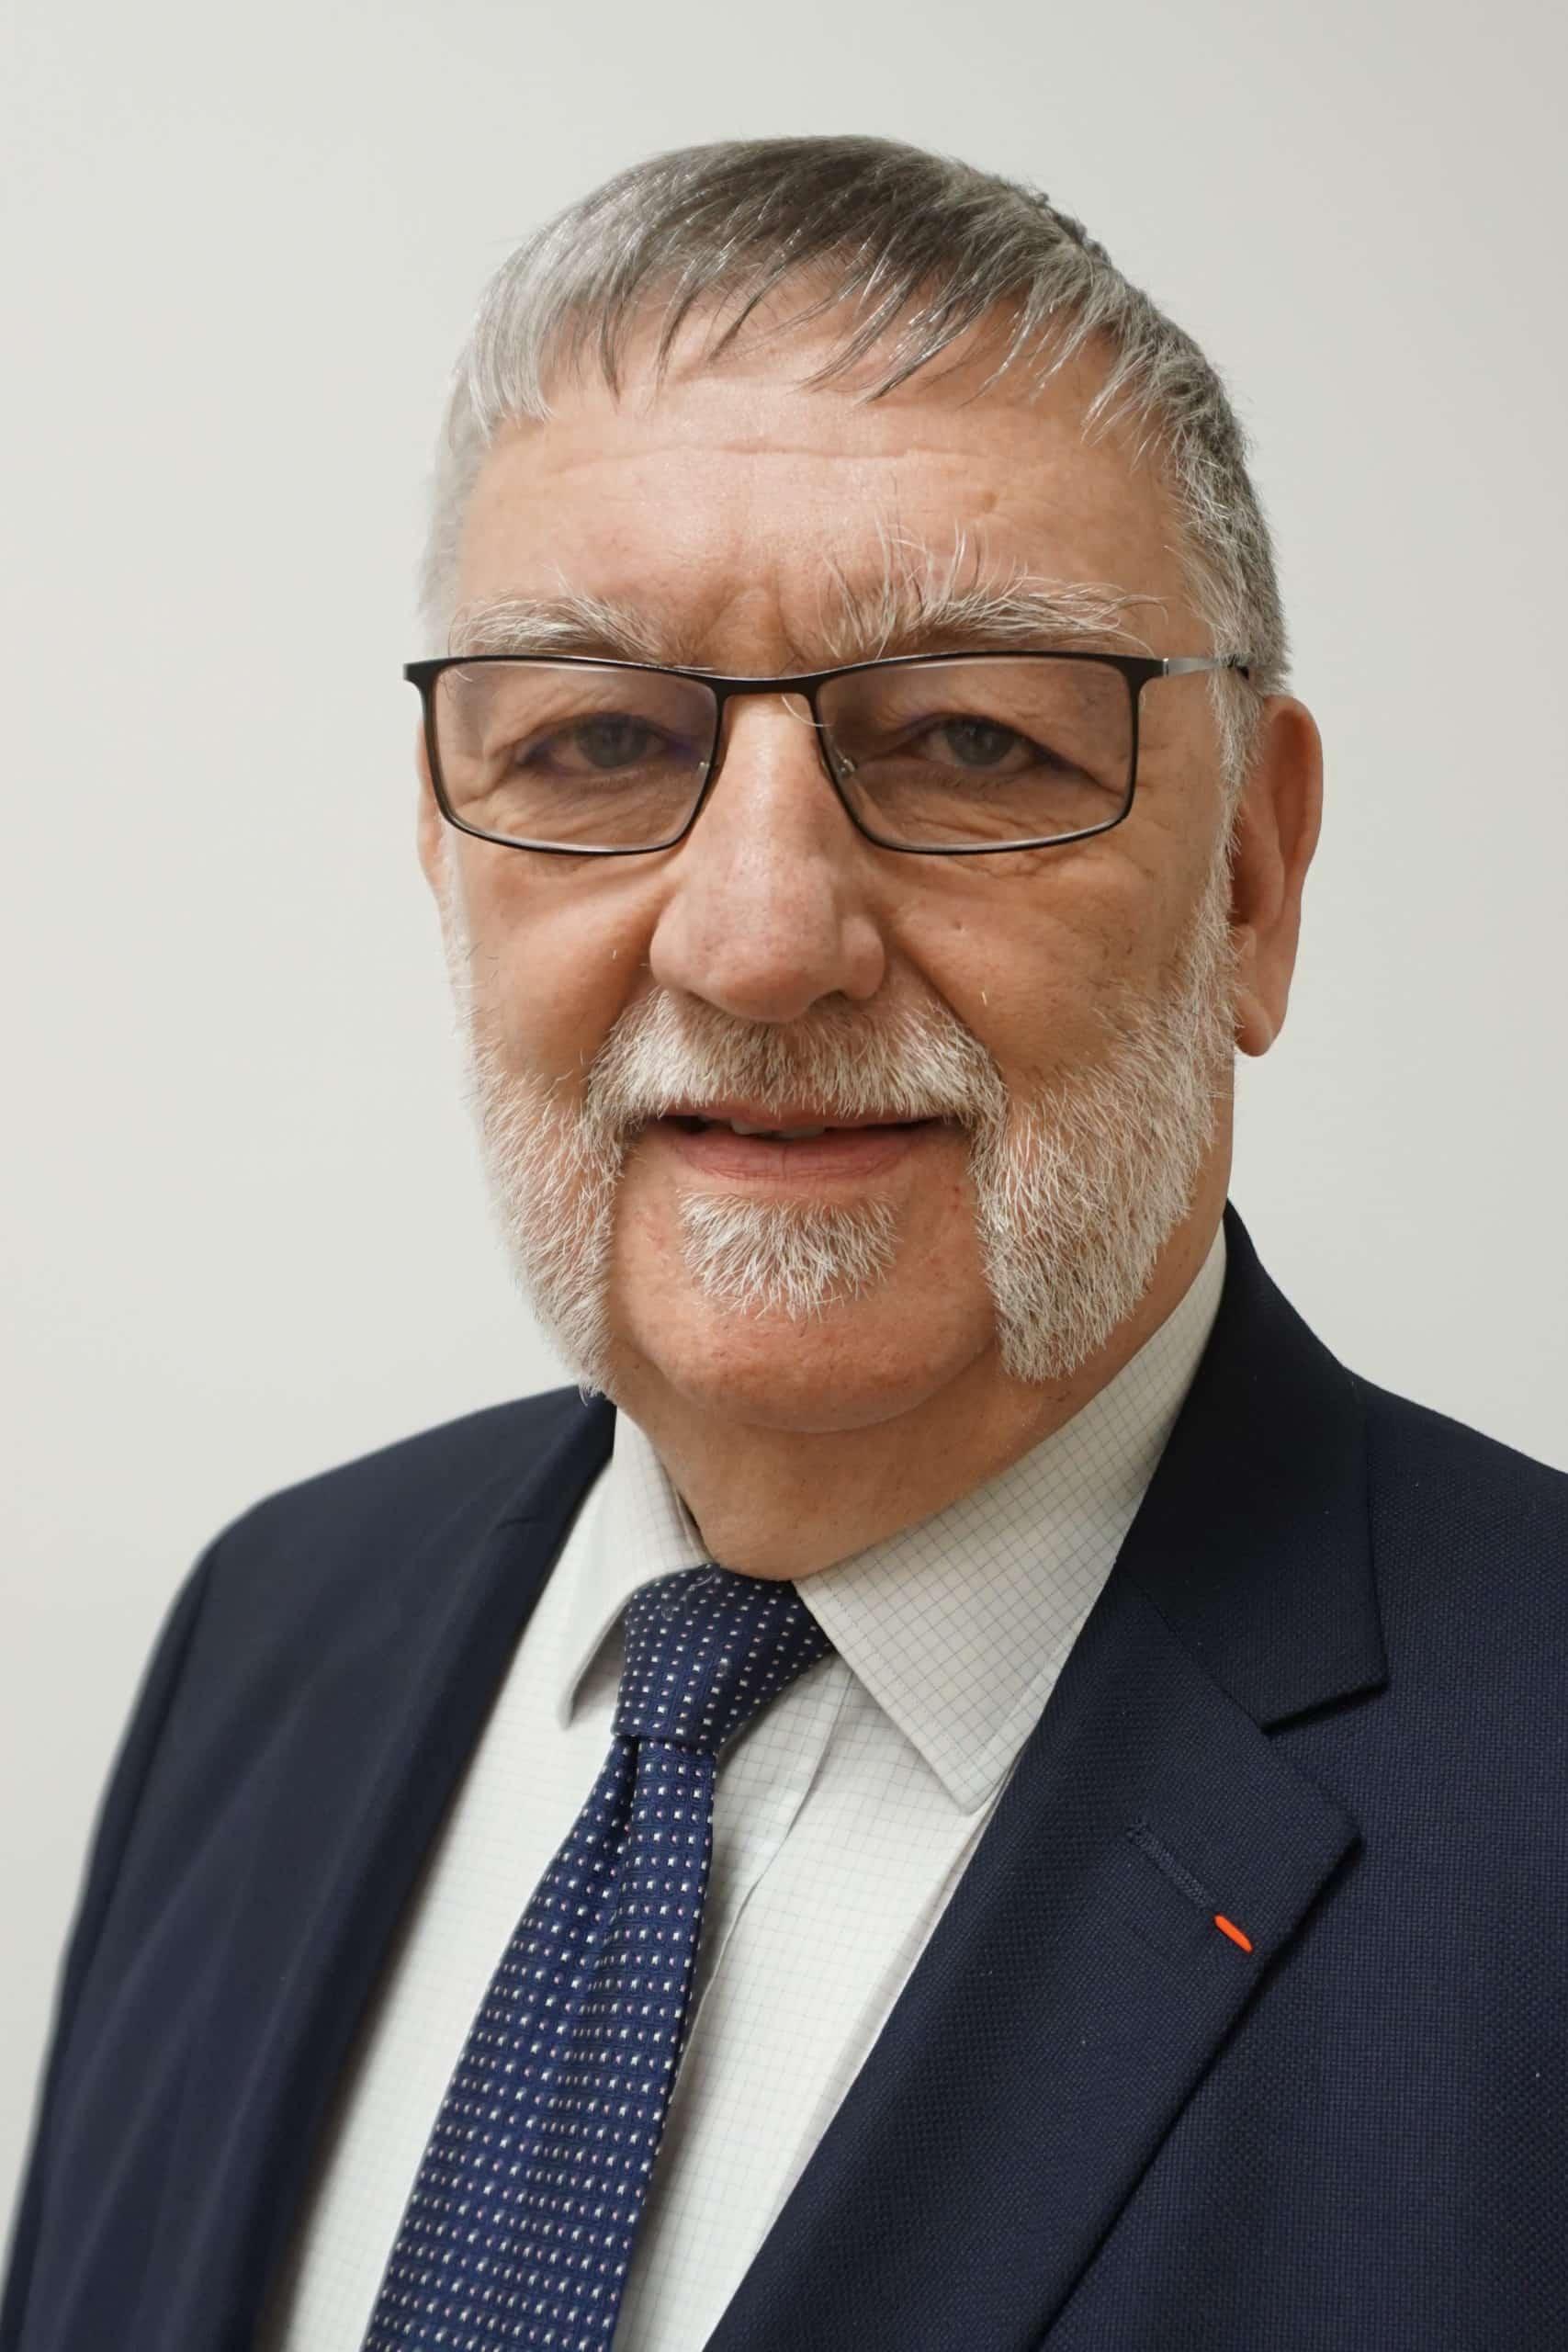 Jean-Paul Lacam